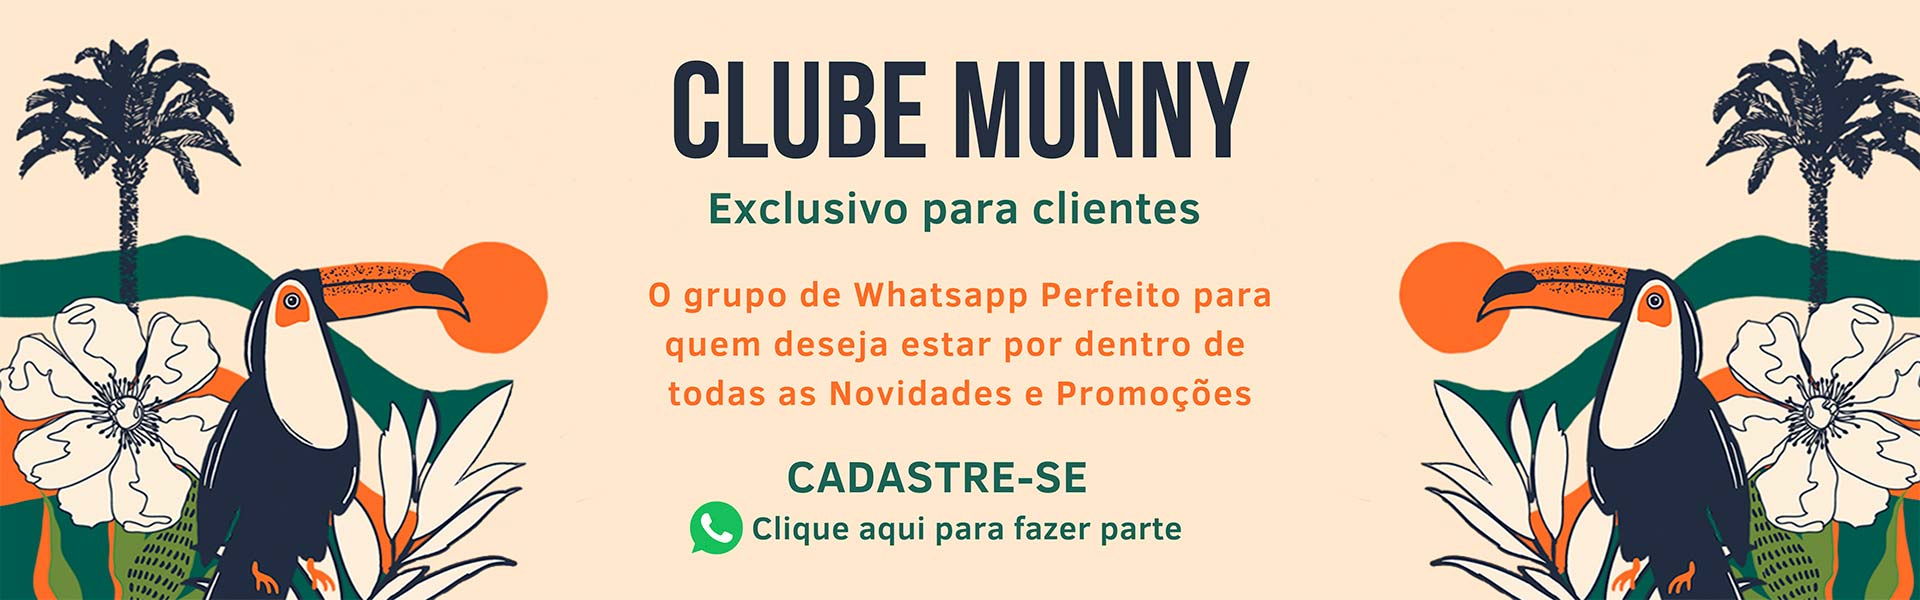 clube munny